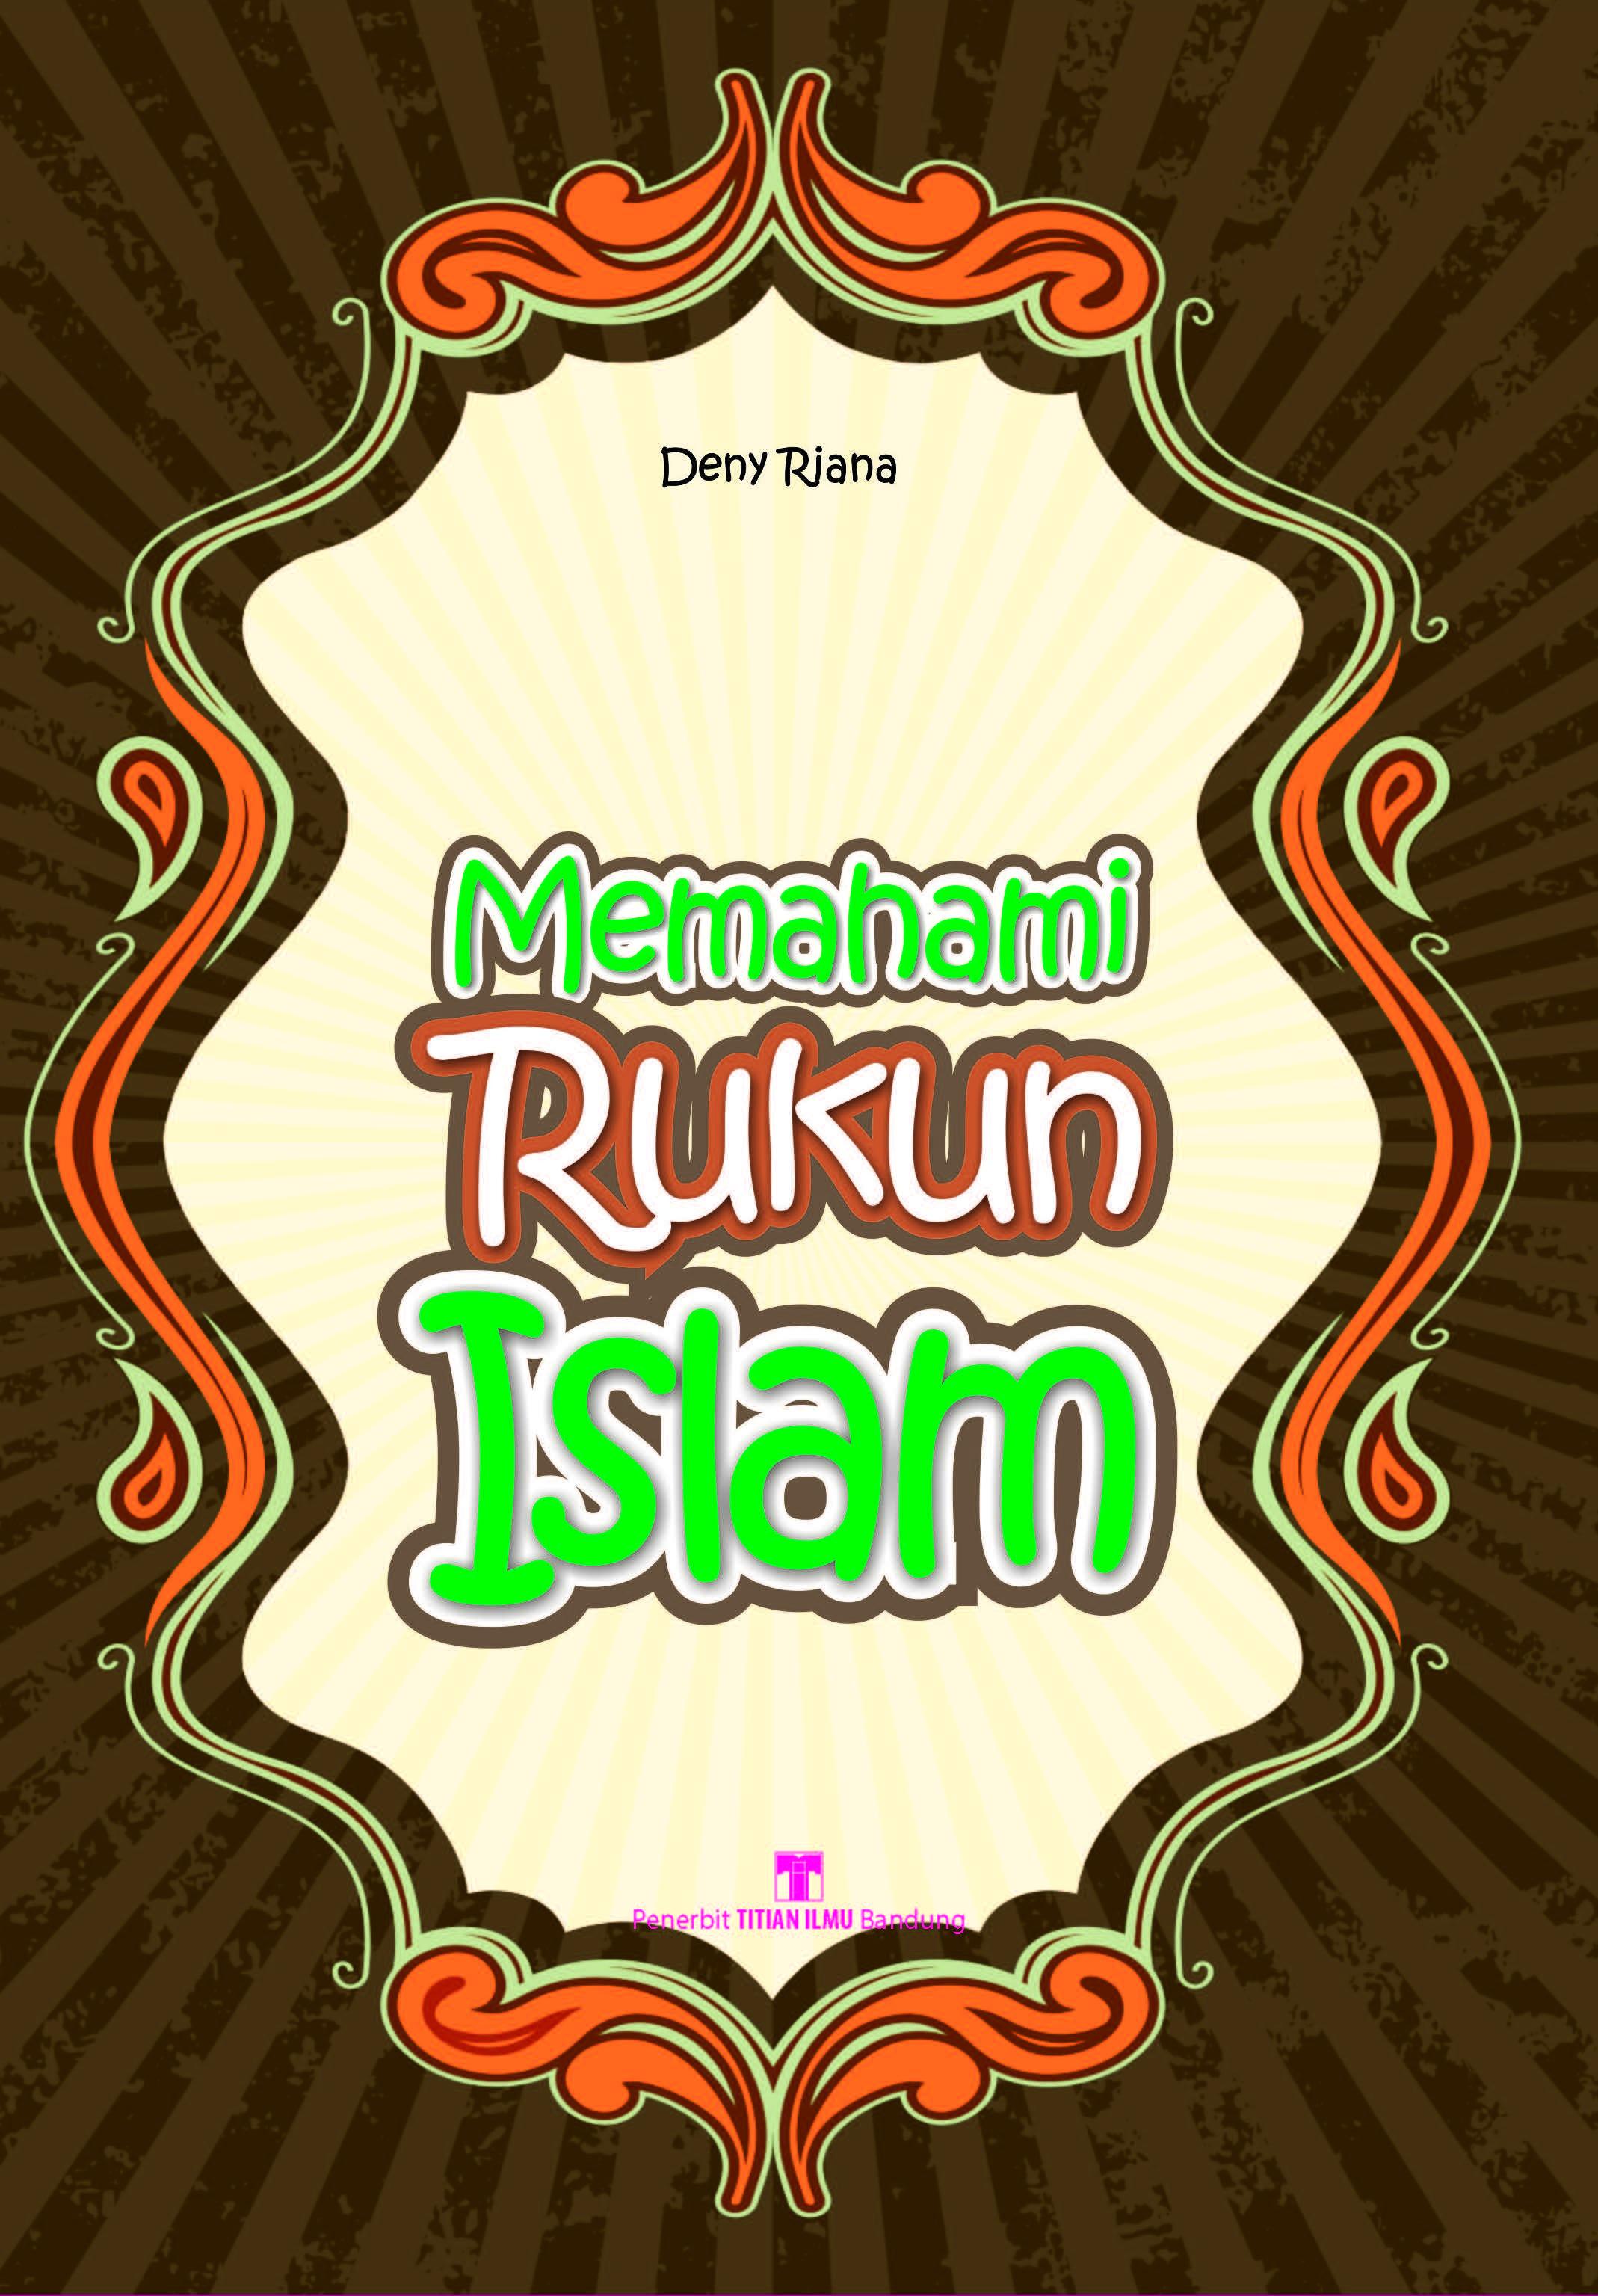 Memahami rukun Islam [sumber elektronis]